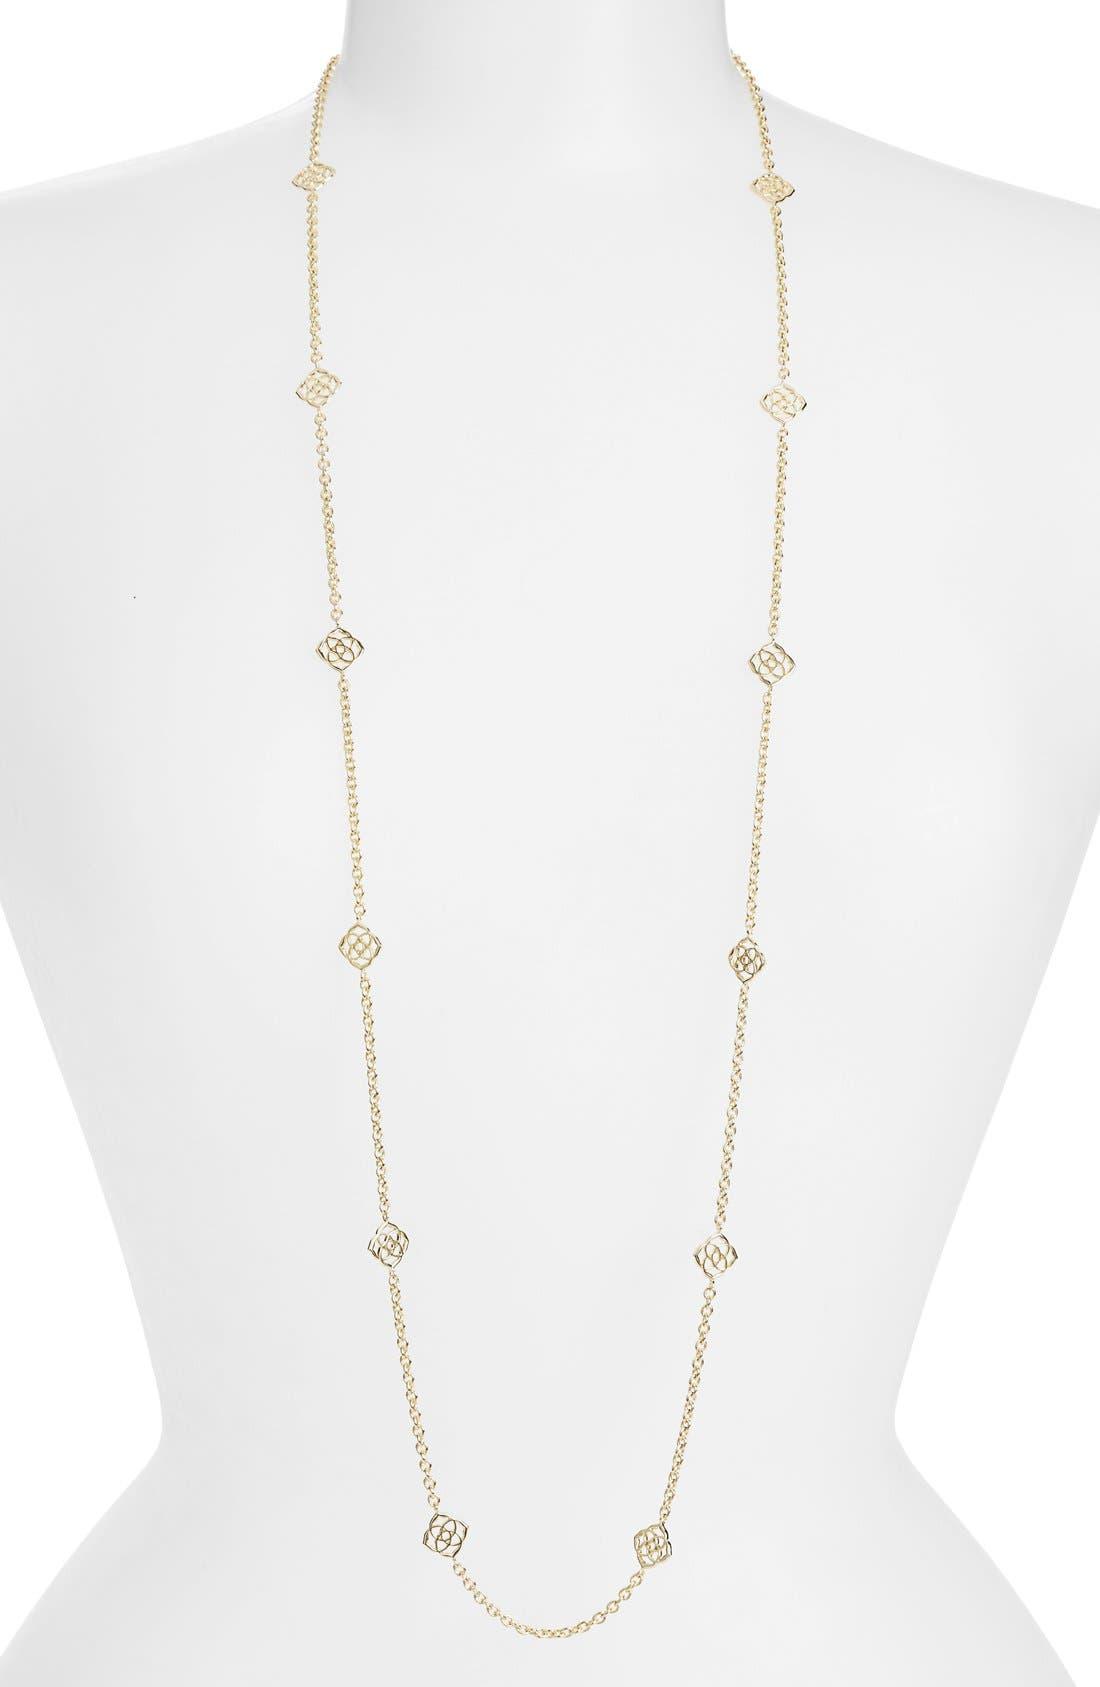 Kendra Scott 'Devalyn' Long Station Necklace